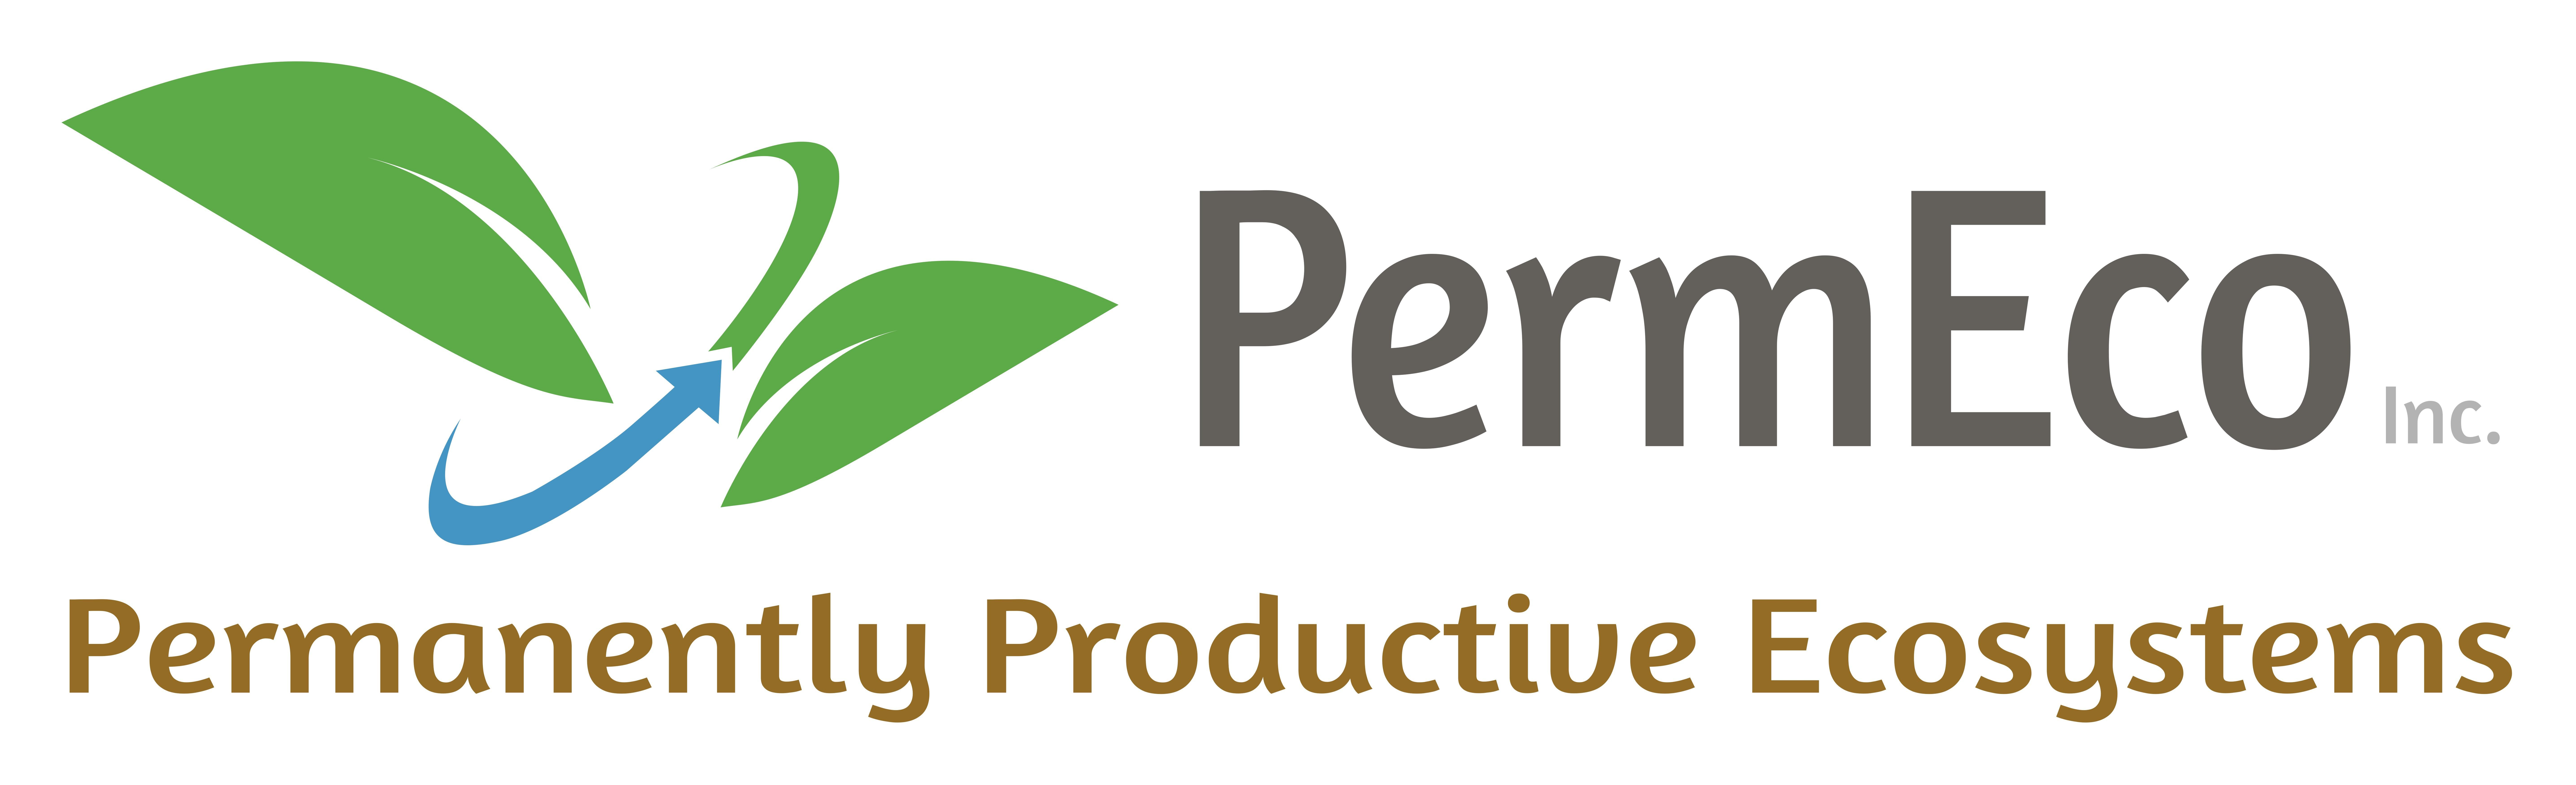 PermEco Inc.